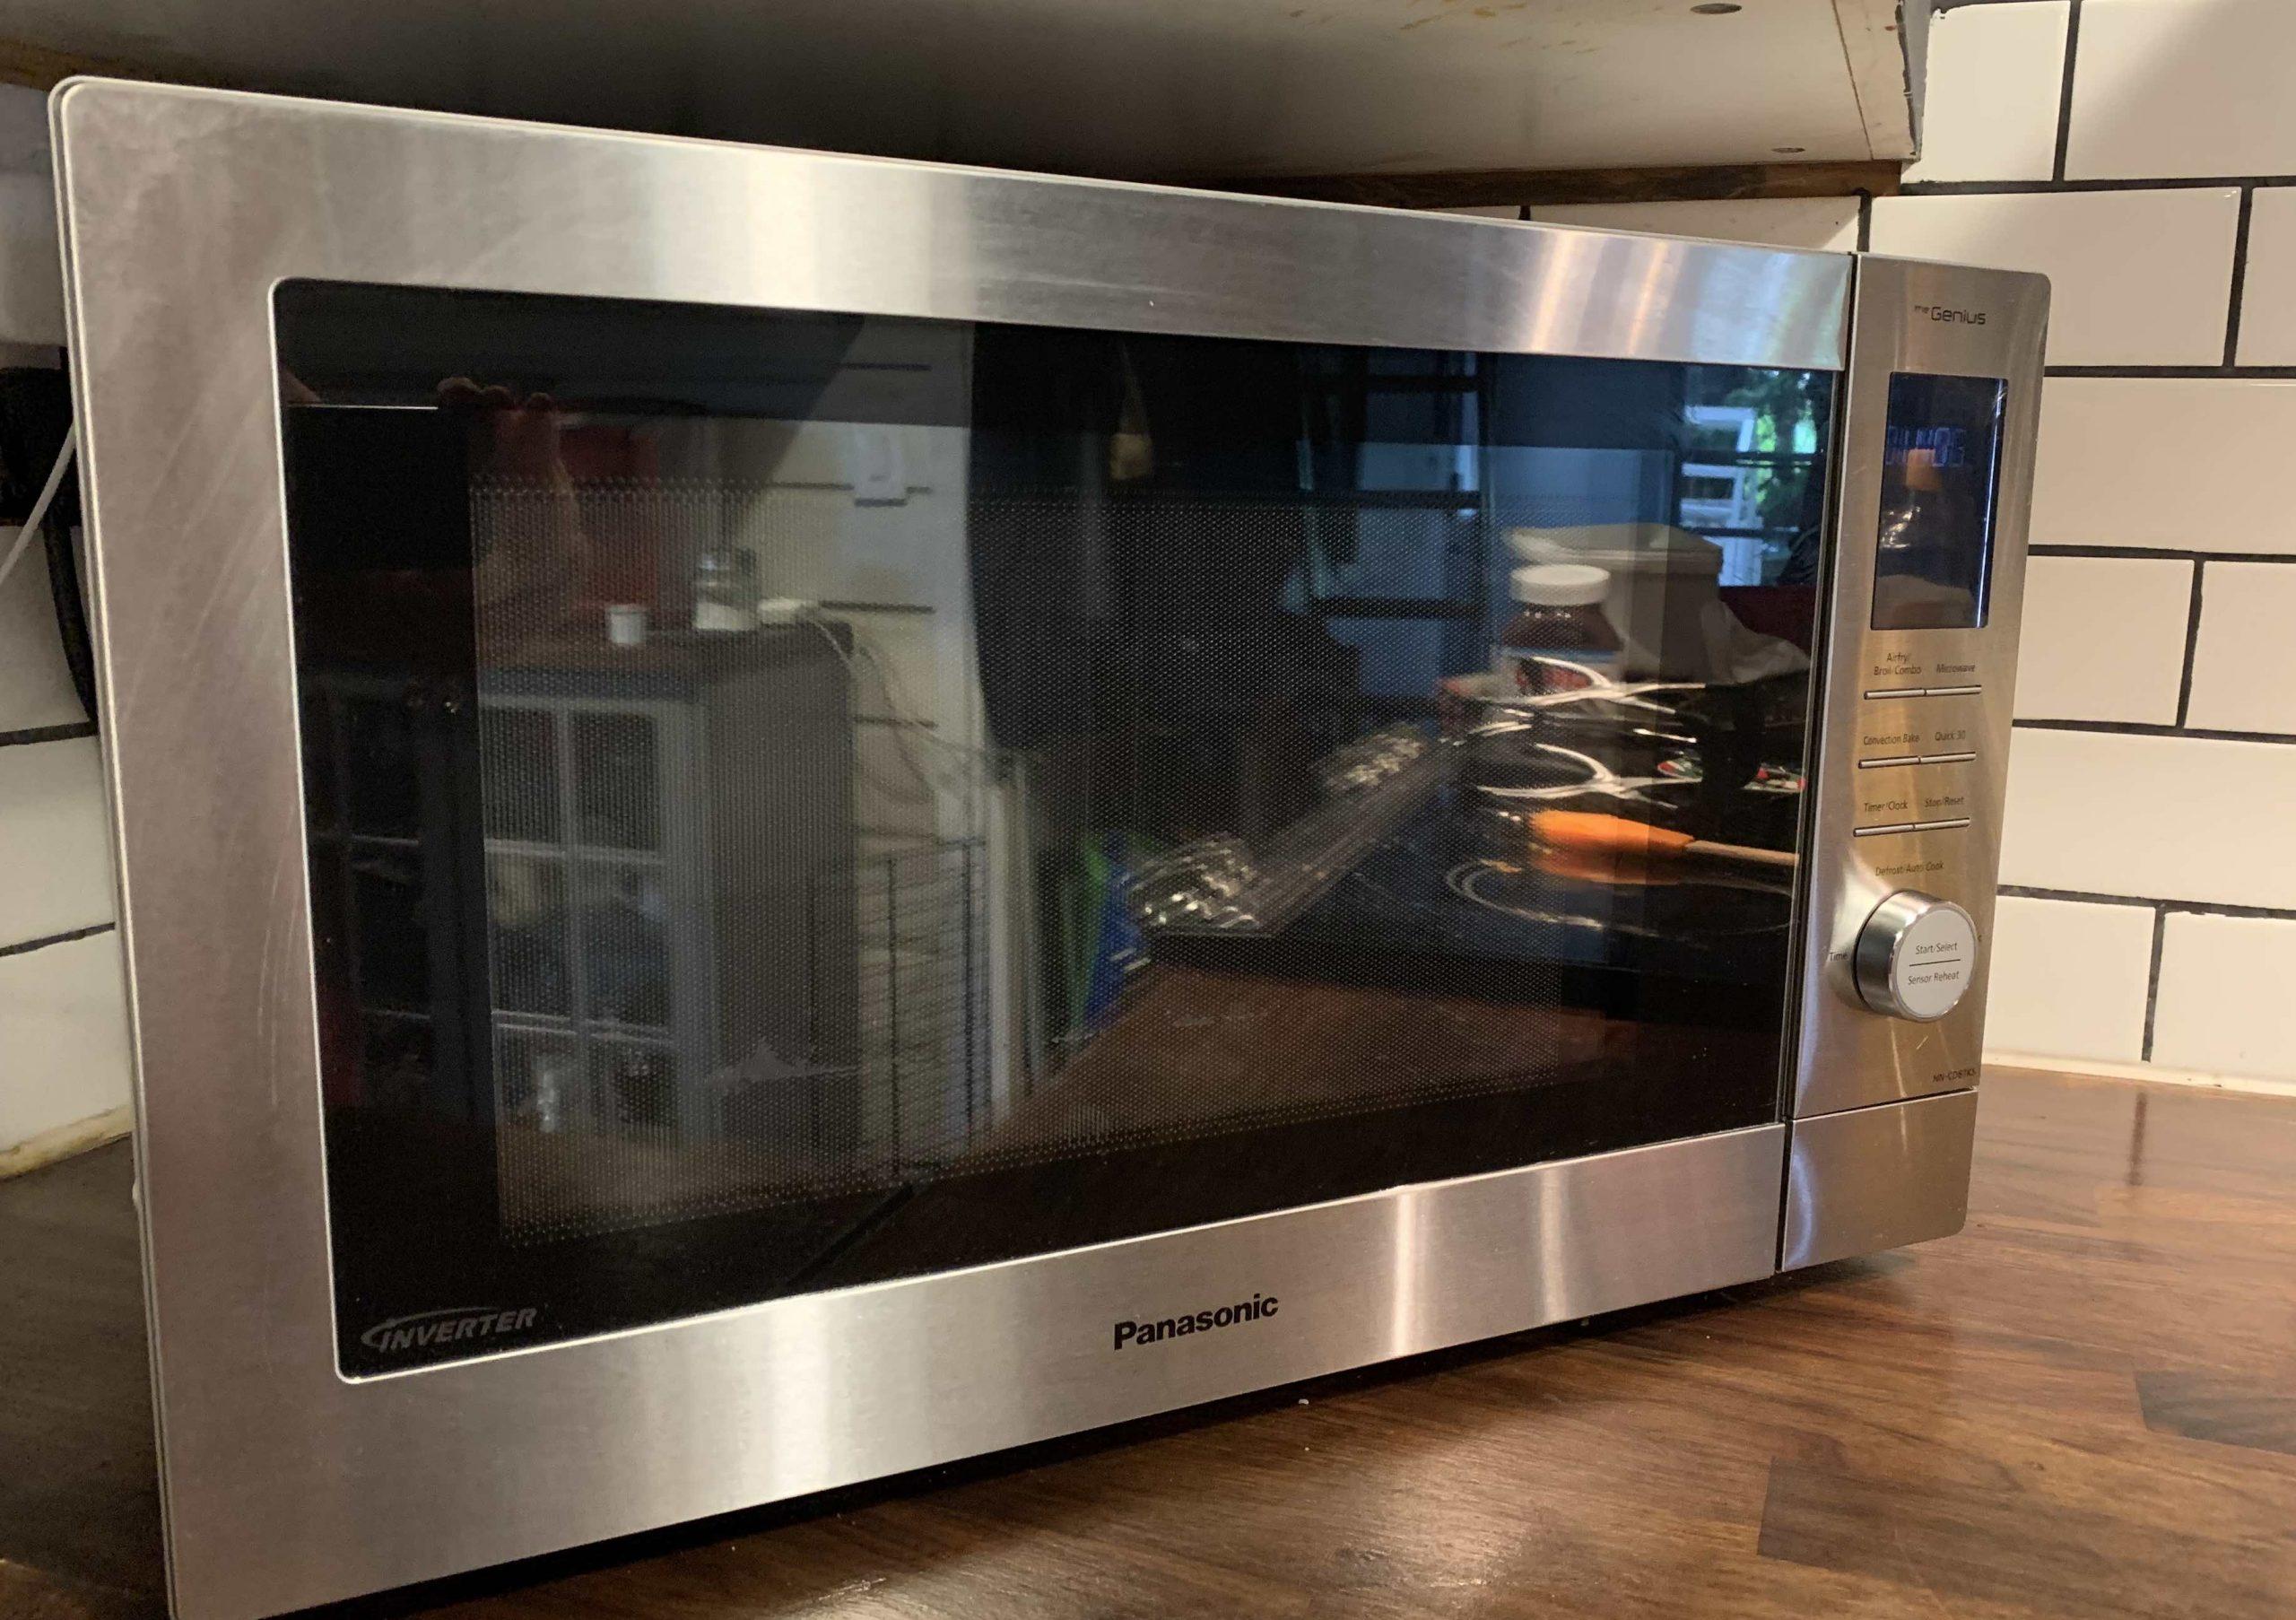 Panasonic Genius 4-in-1 Microwave Review